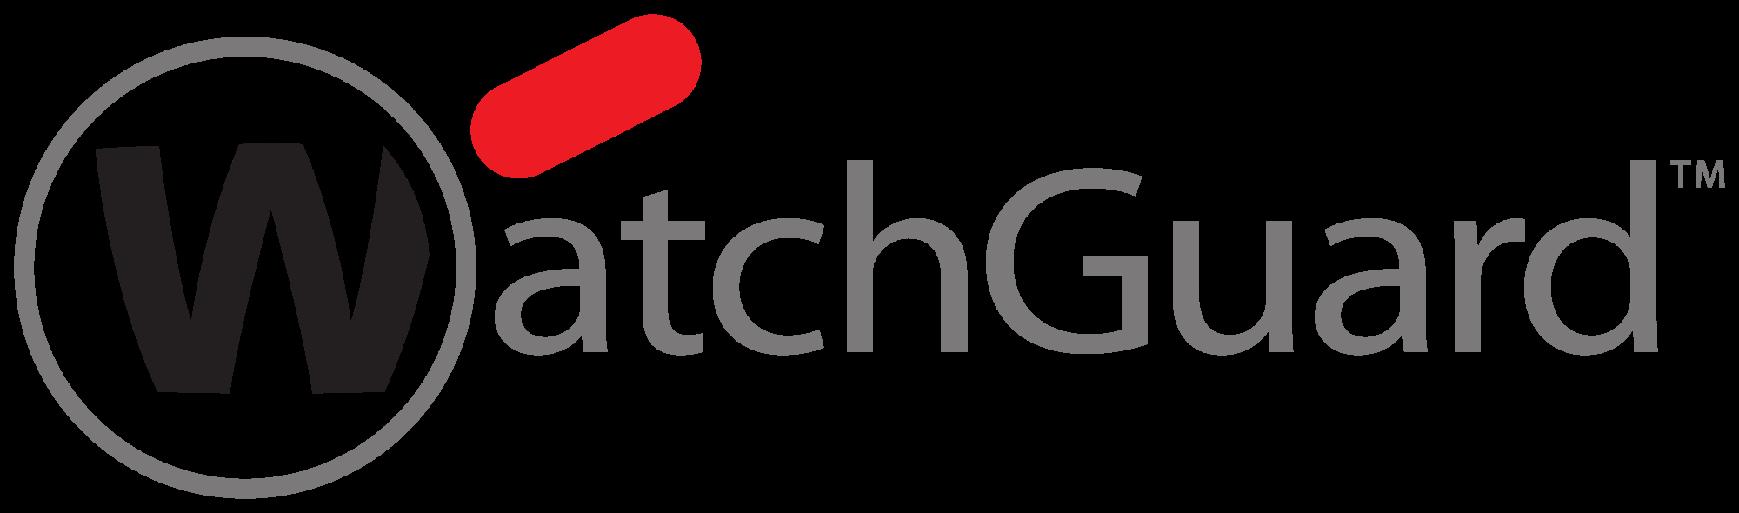 2000px-Watchguard_logo_edited.png